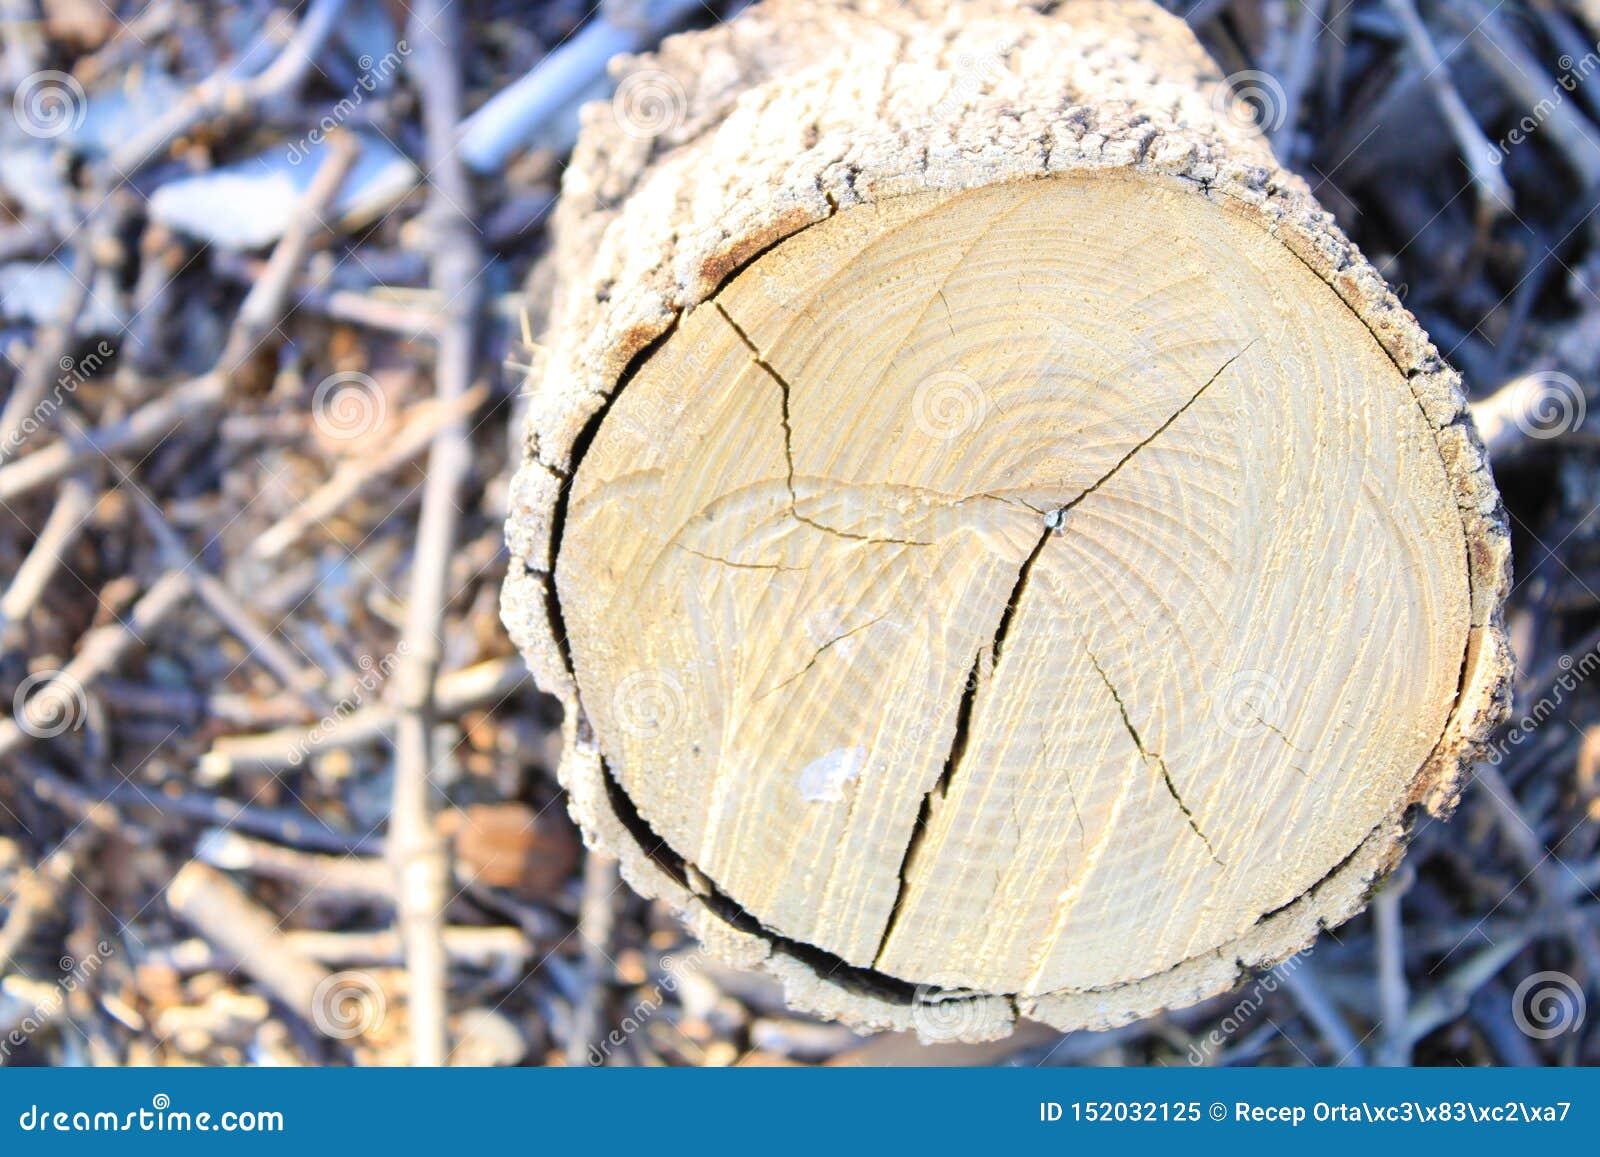 Close-up firewood and tree stump.